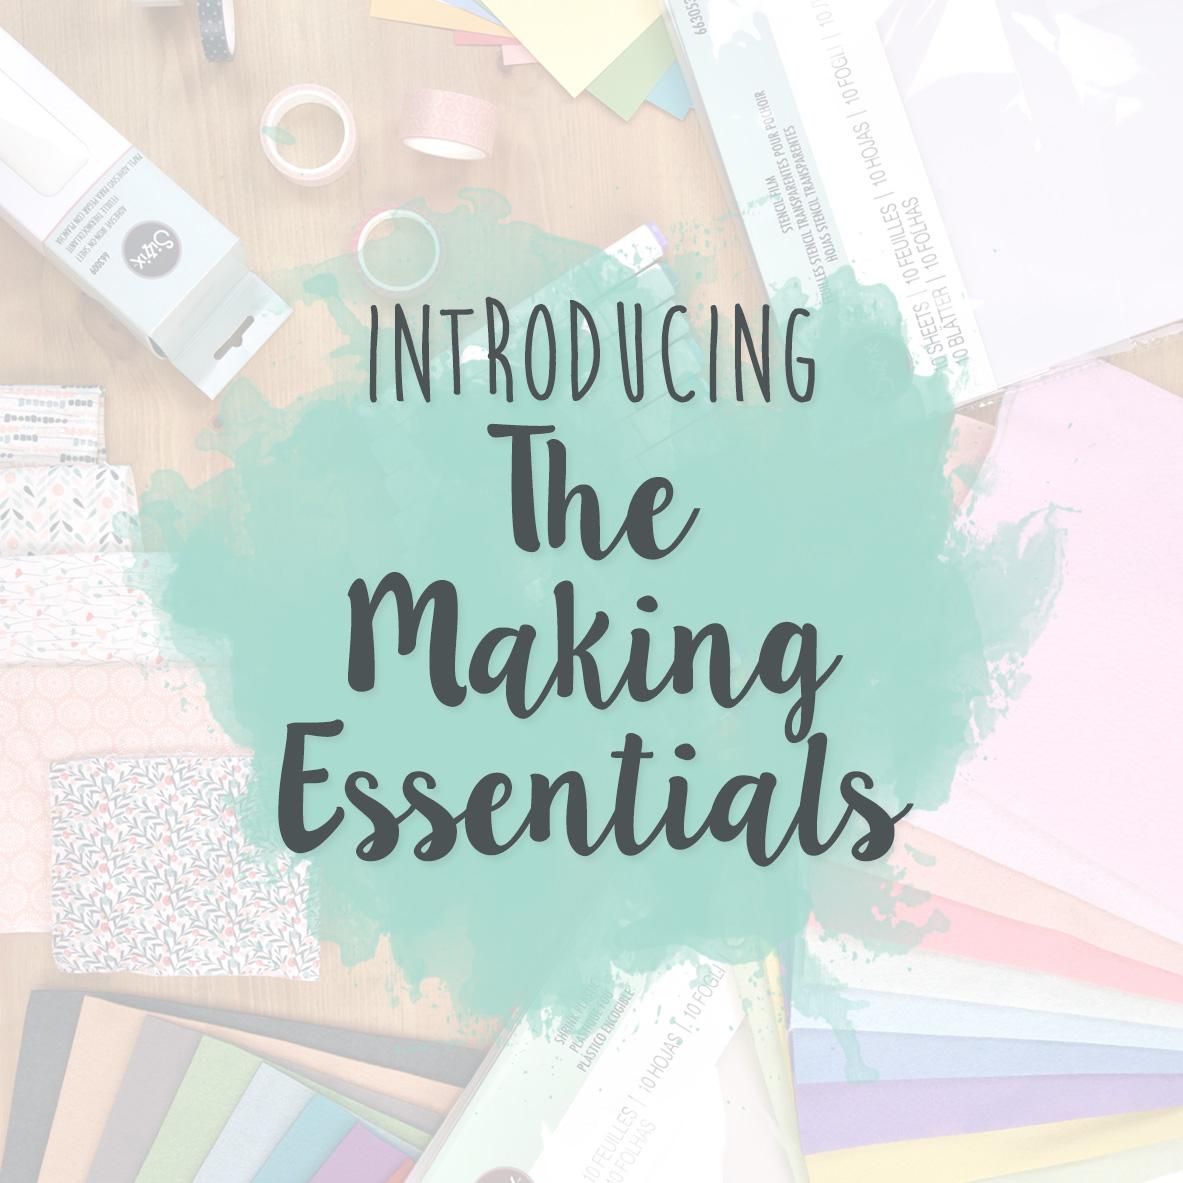 The Making Essentials